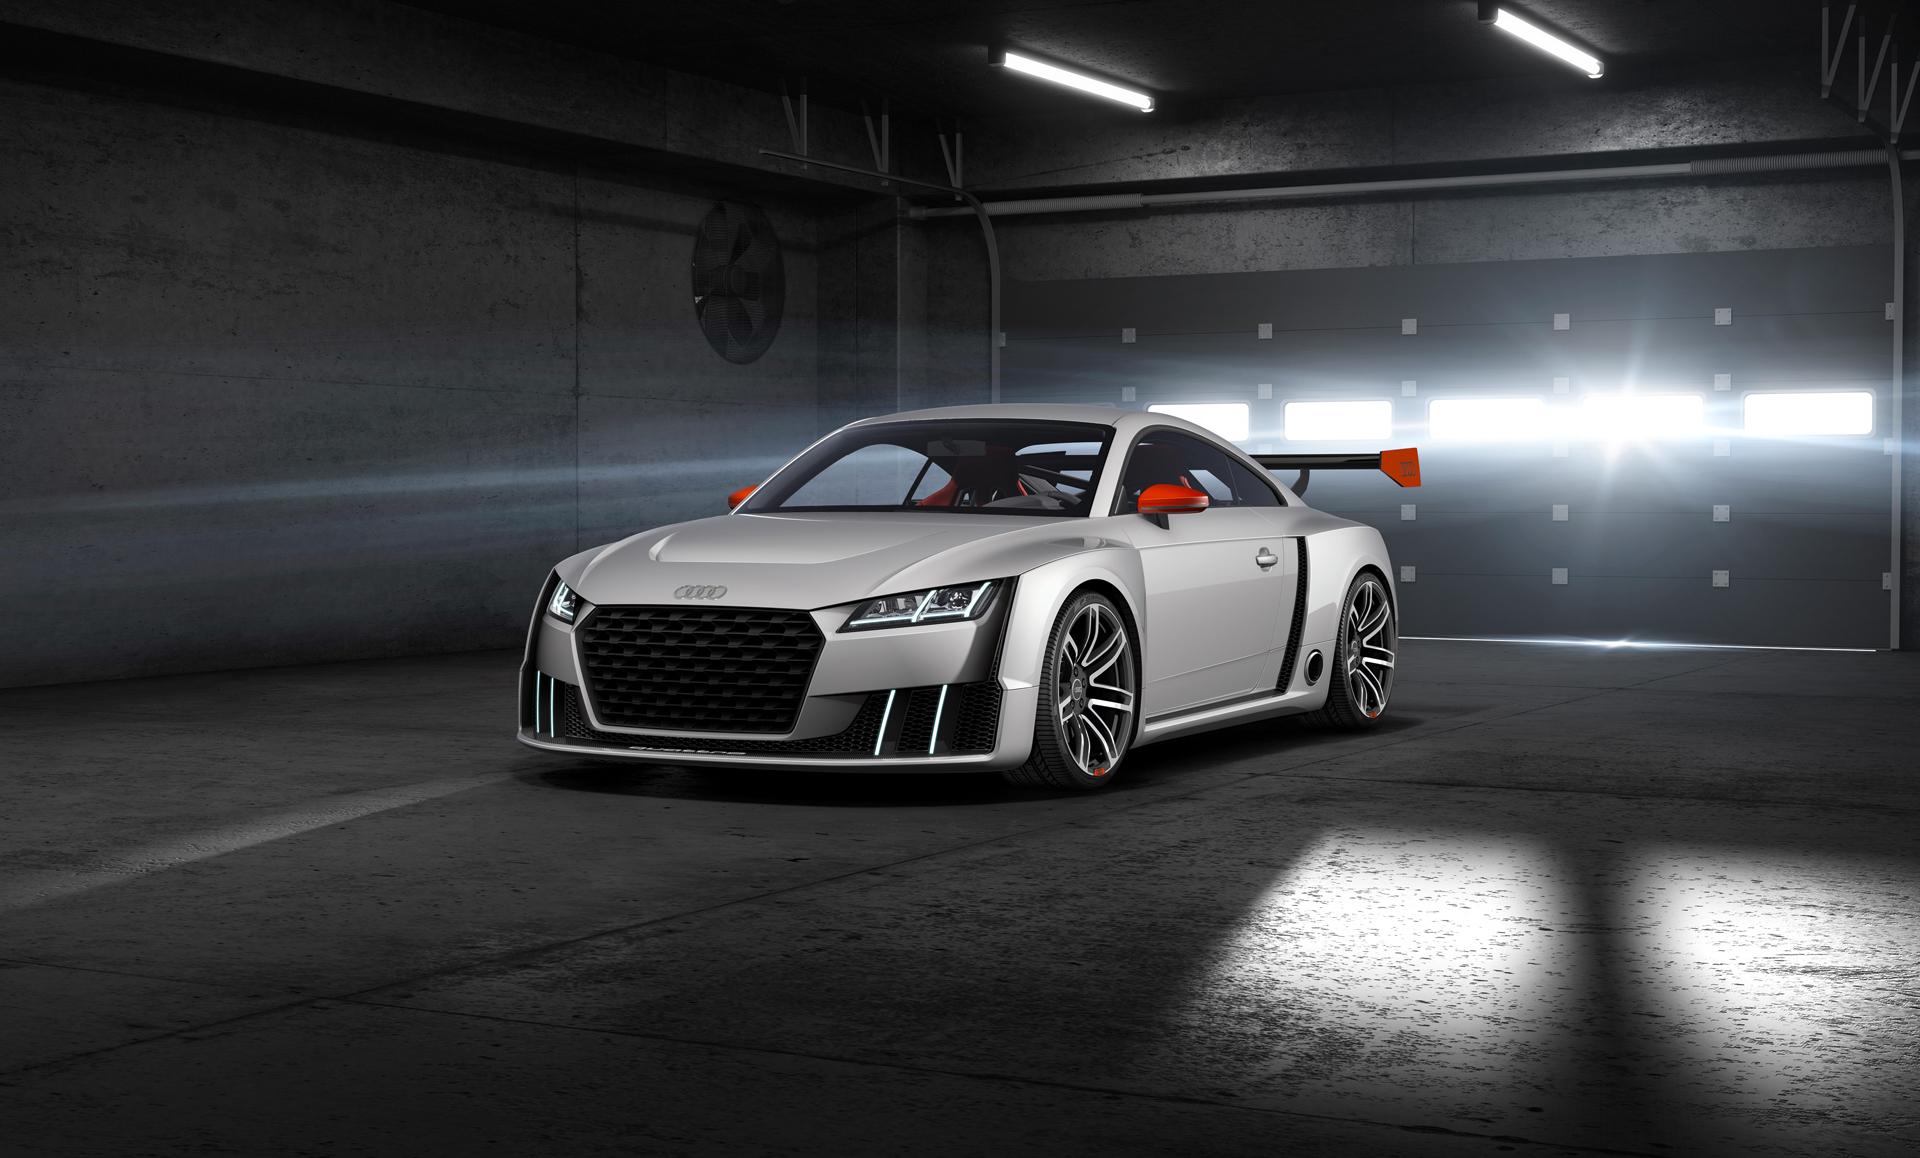 Audi TT clubsport turbo concept - front / avant